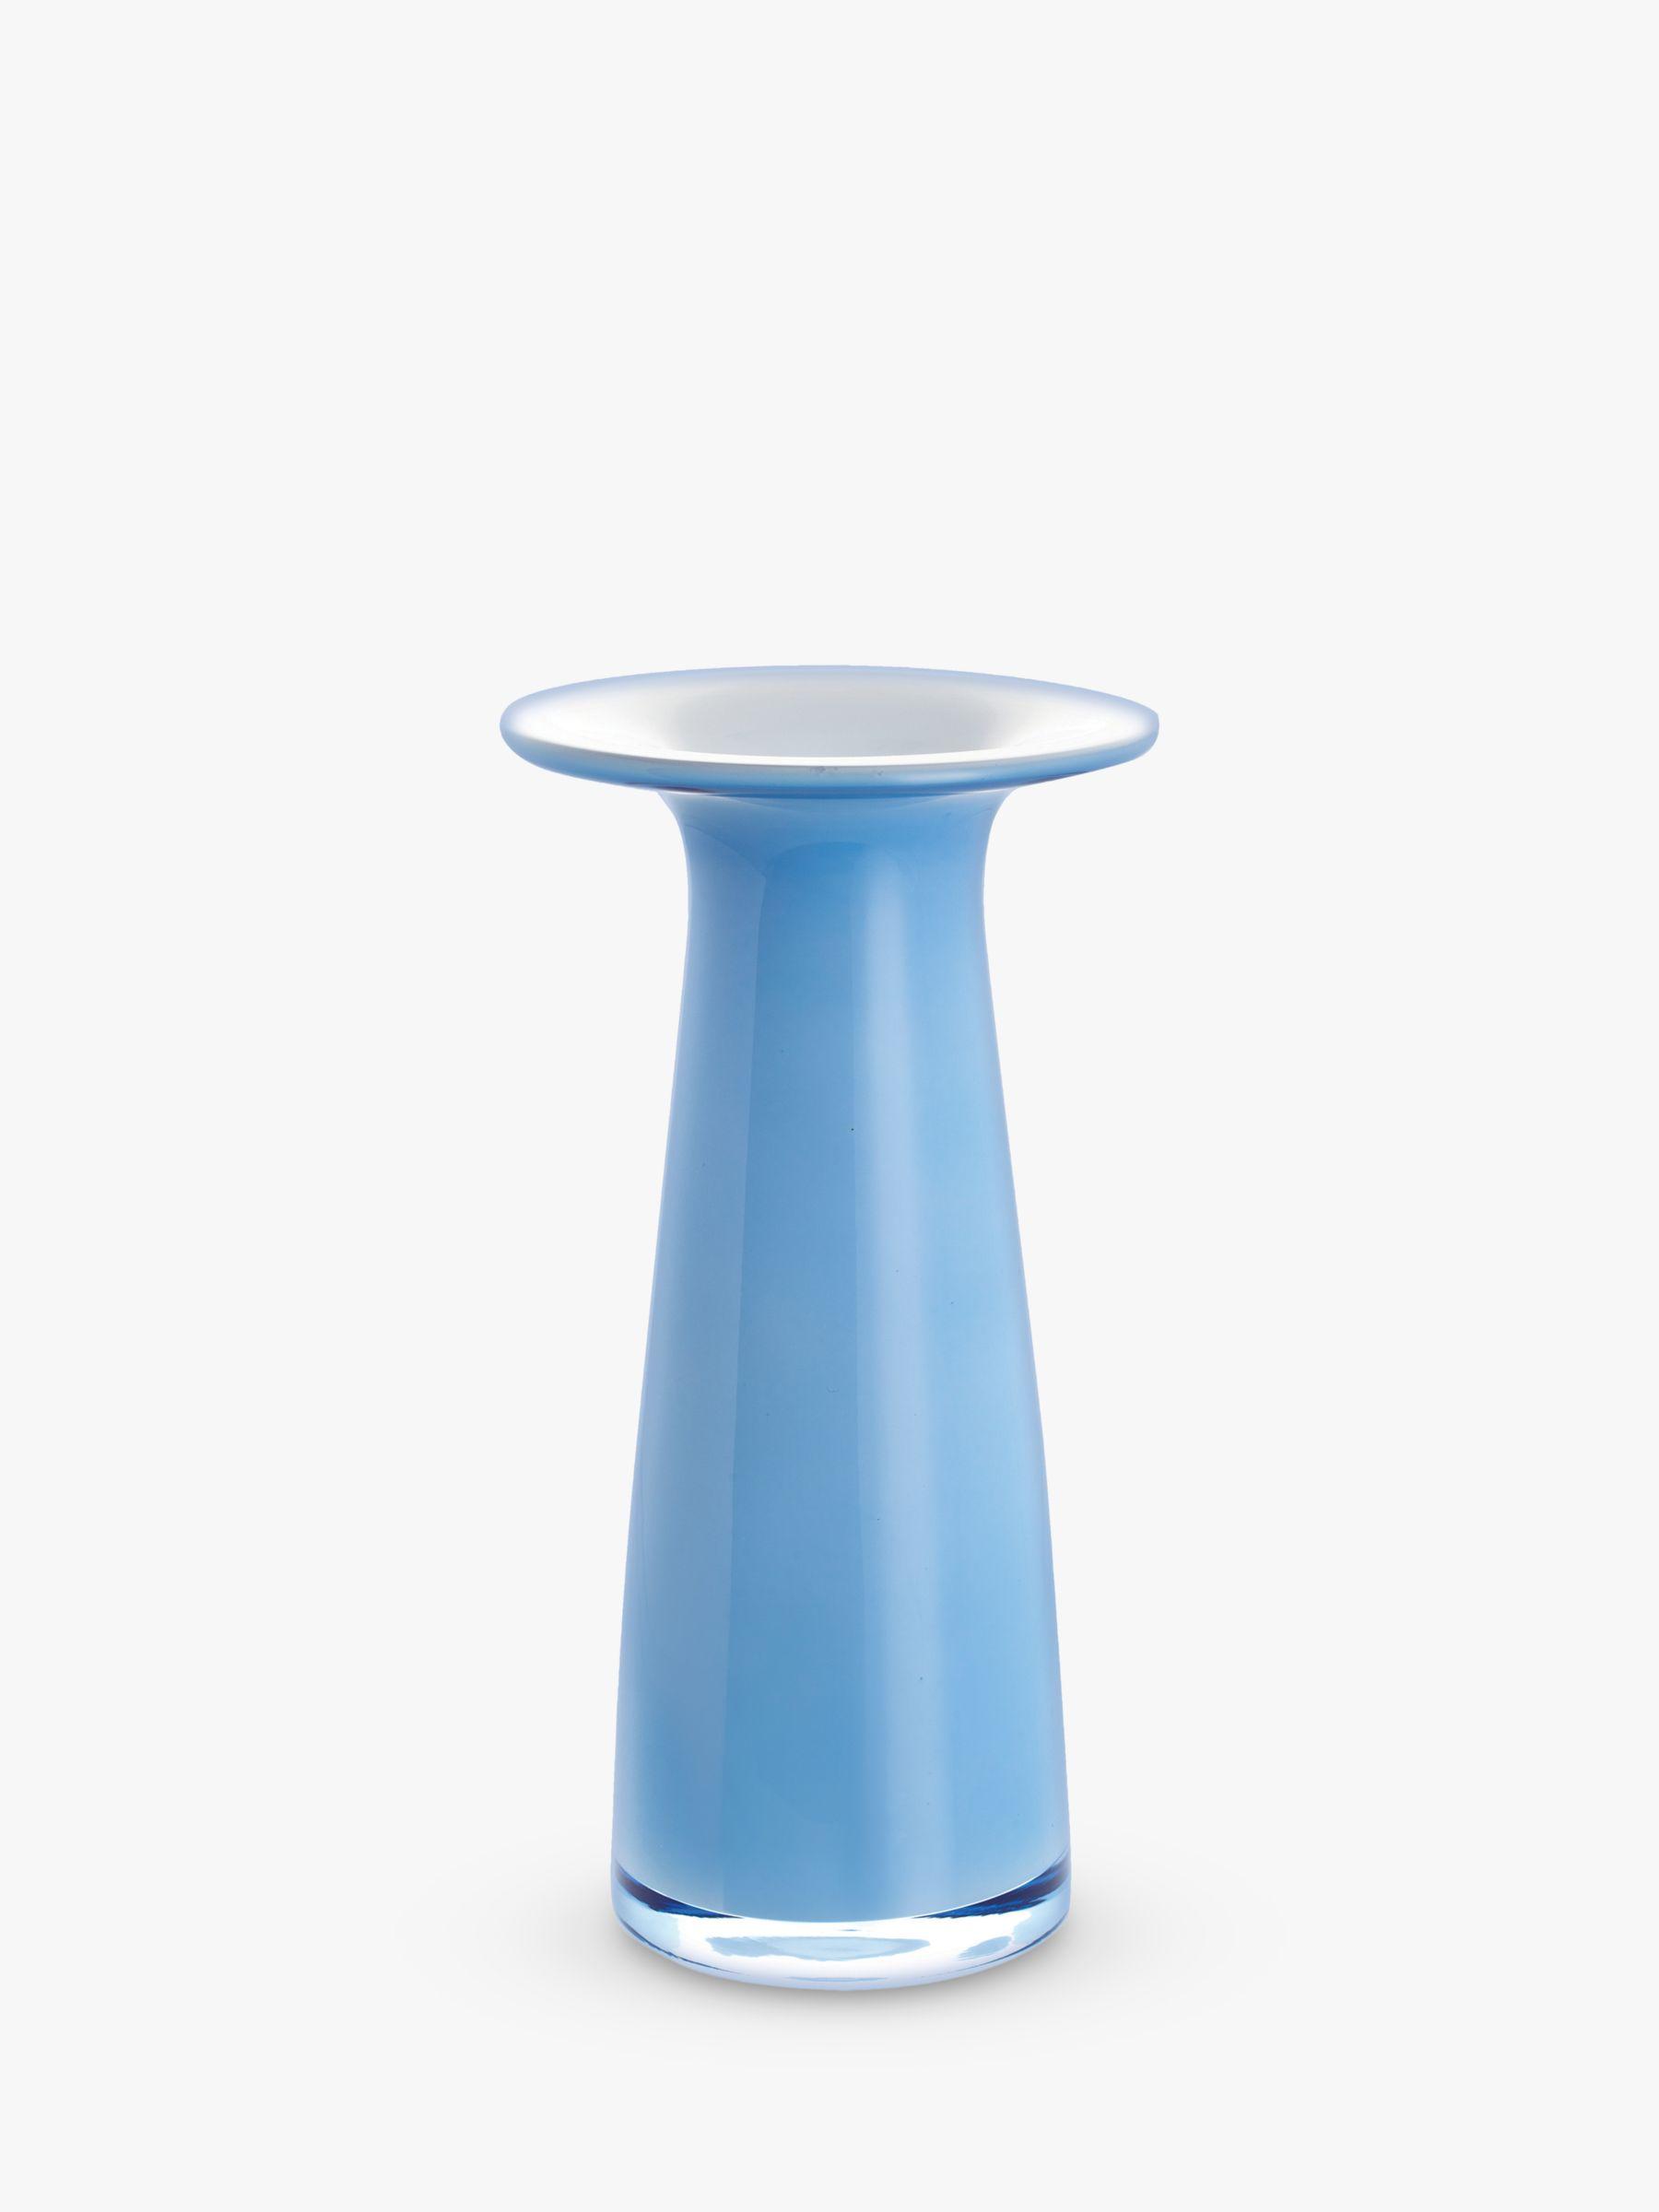 Dartington Crystal Dartington Crystal Juno Vase, H19cm